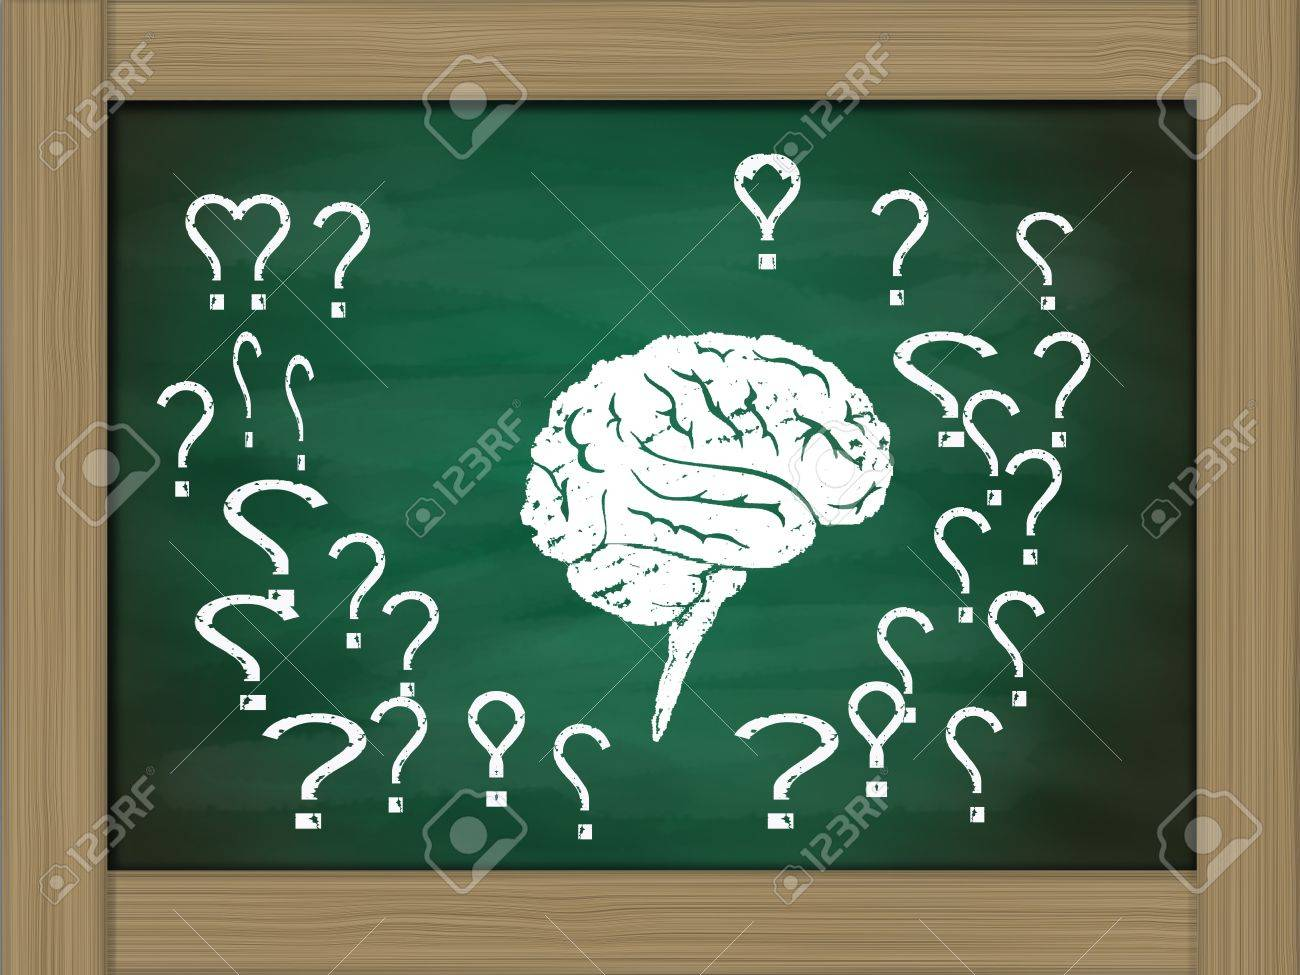 brain thinking conceptual on green chalkboard Stock Photo - 14031784